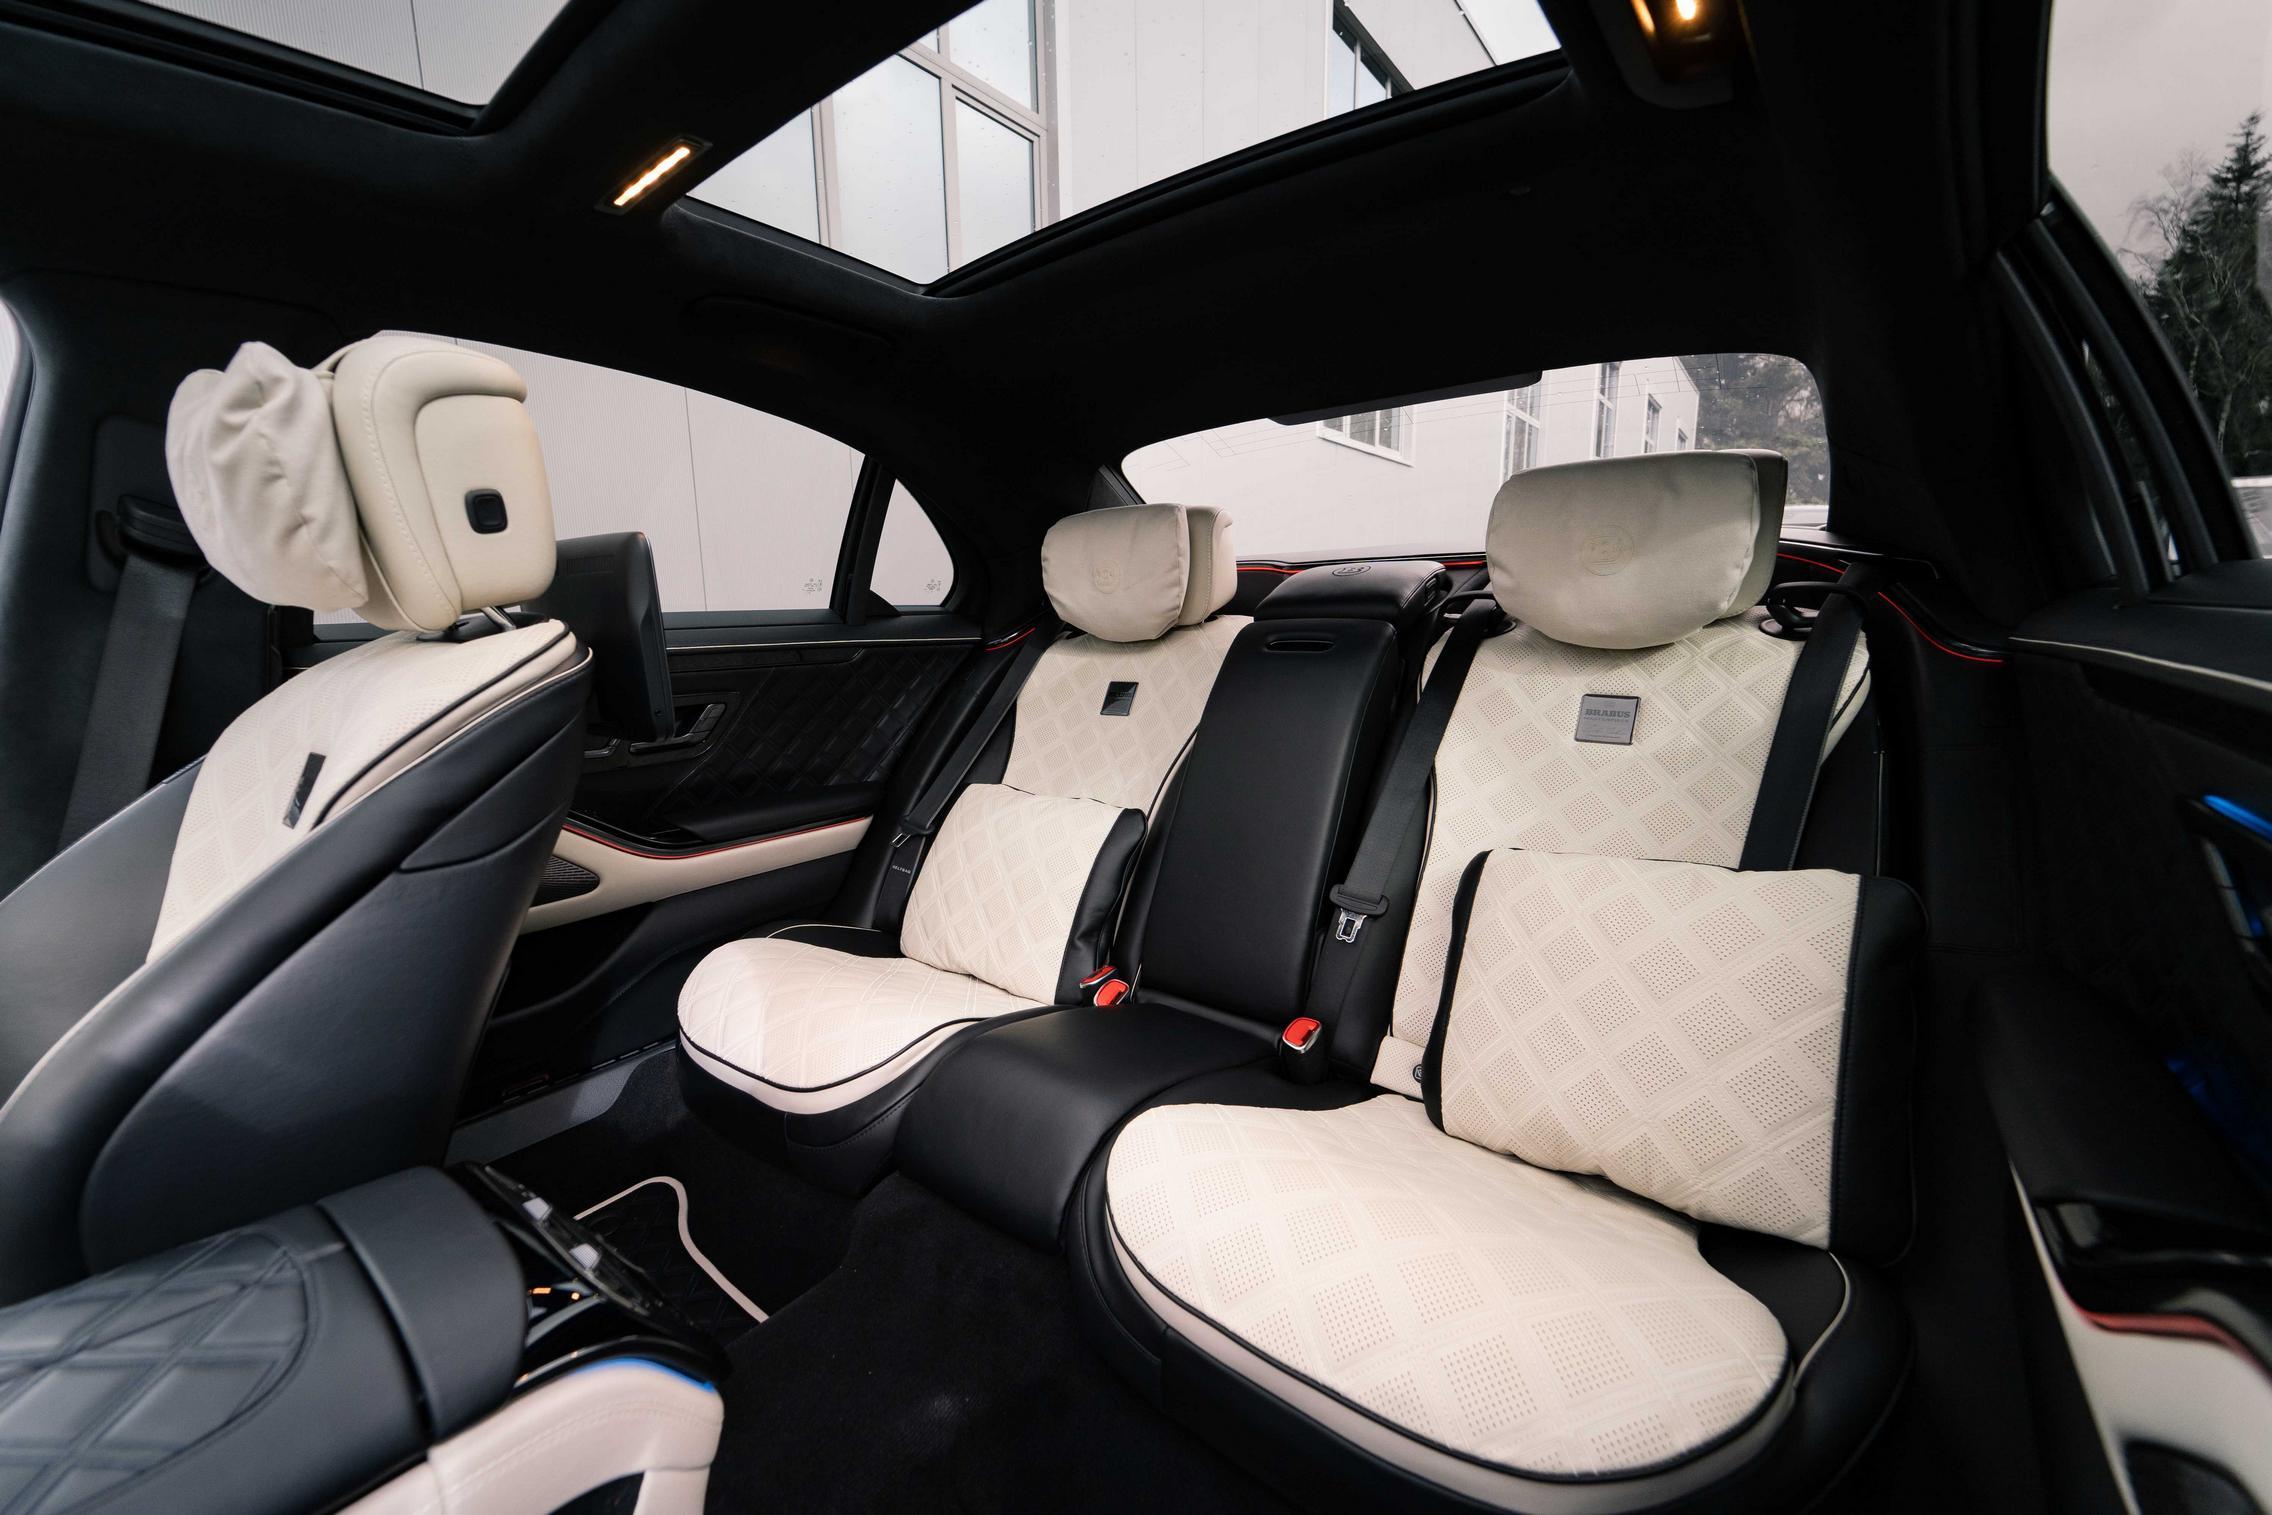 Brabus S-Class rear seats